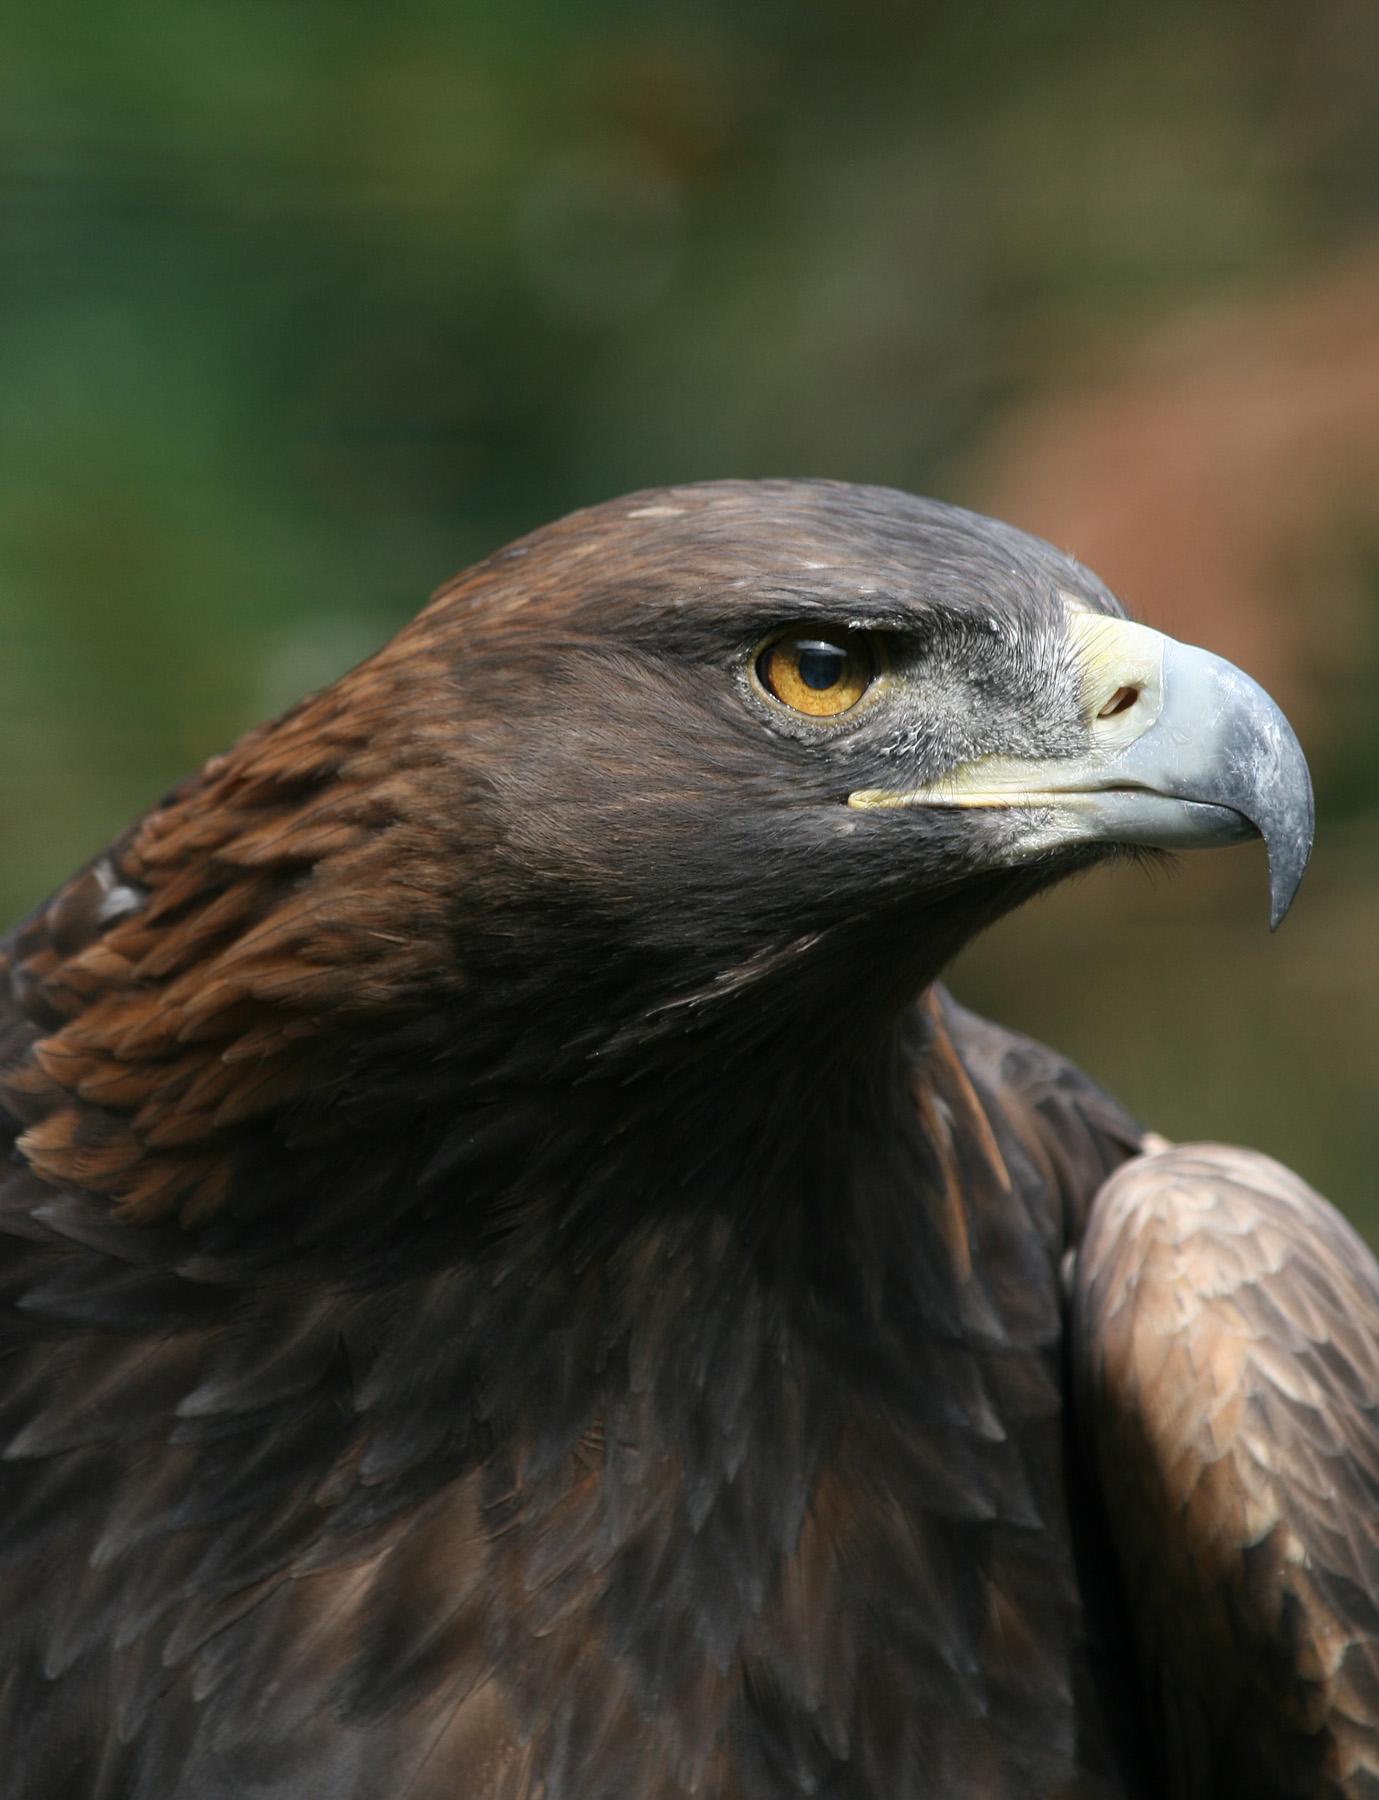 Download 56+ Foto Gambar Burung Elang Emas HD Paling Keren